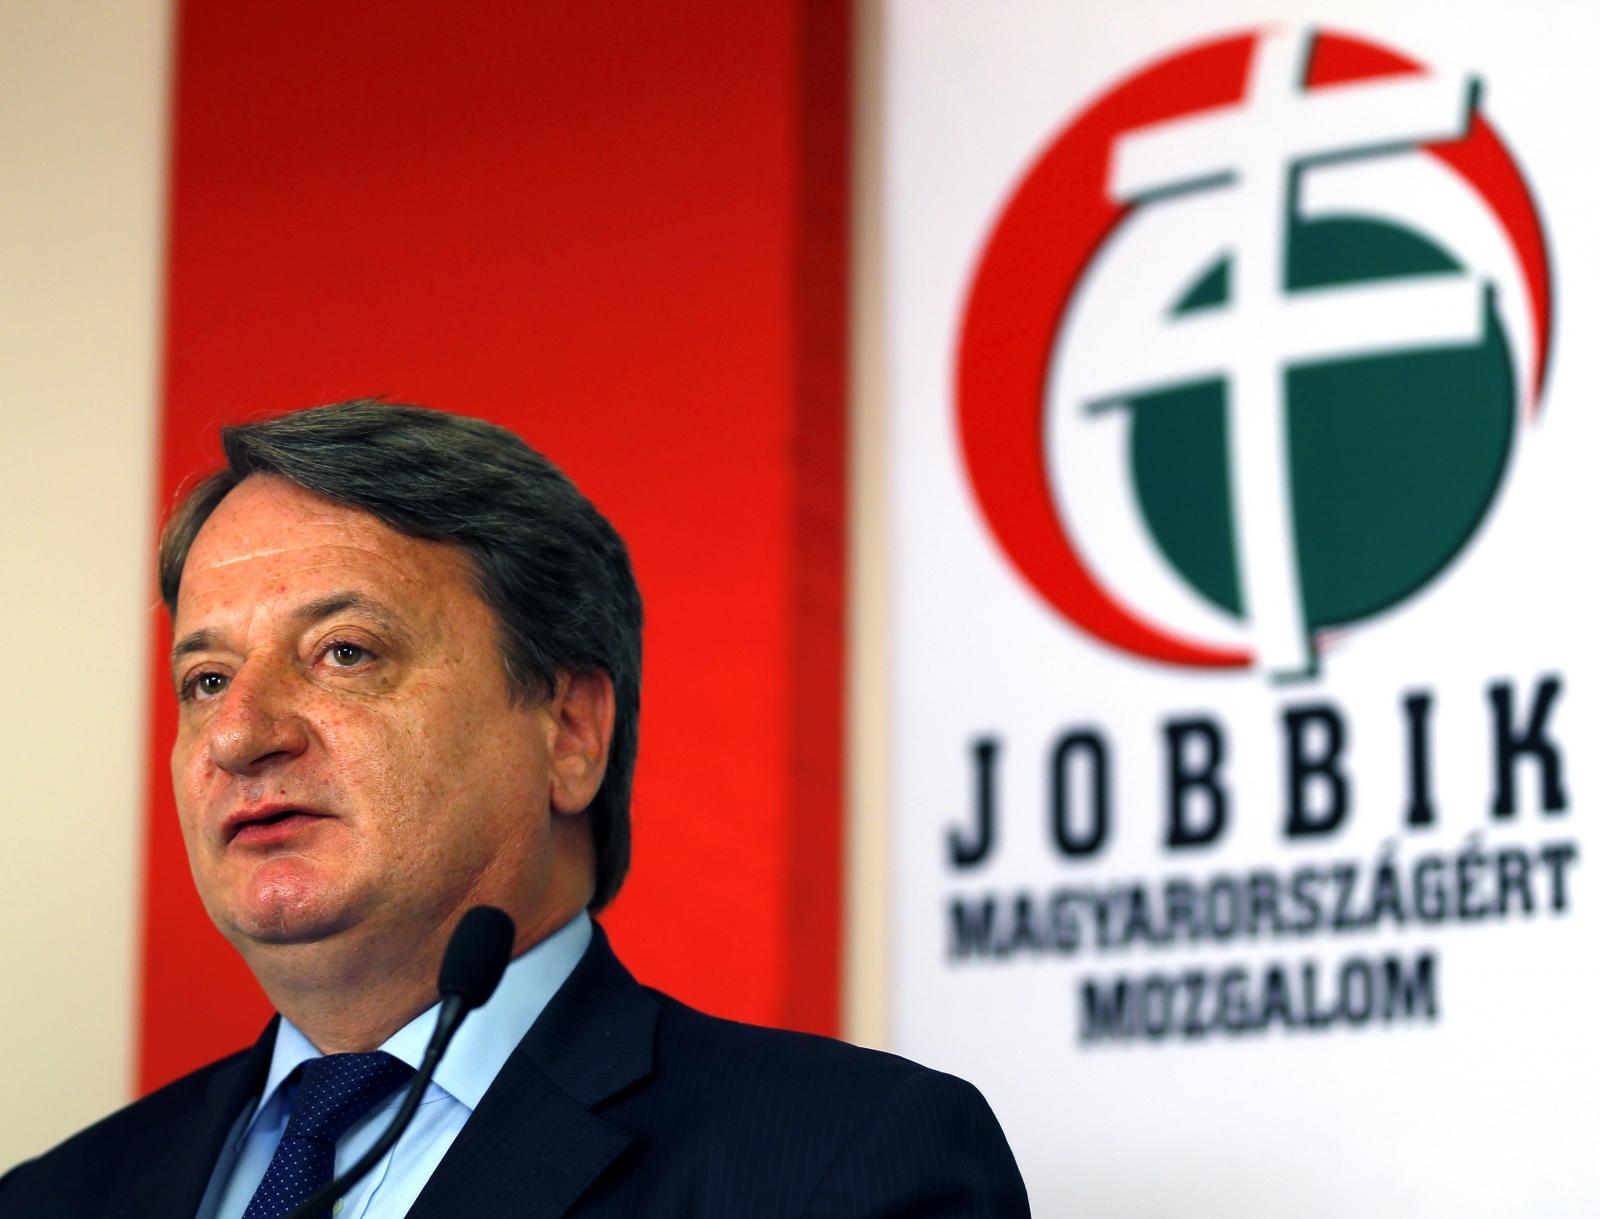 Bela Kovacs, MEP for Hungarian far-right party Jobbik. (Reuters)